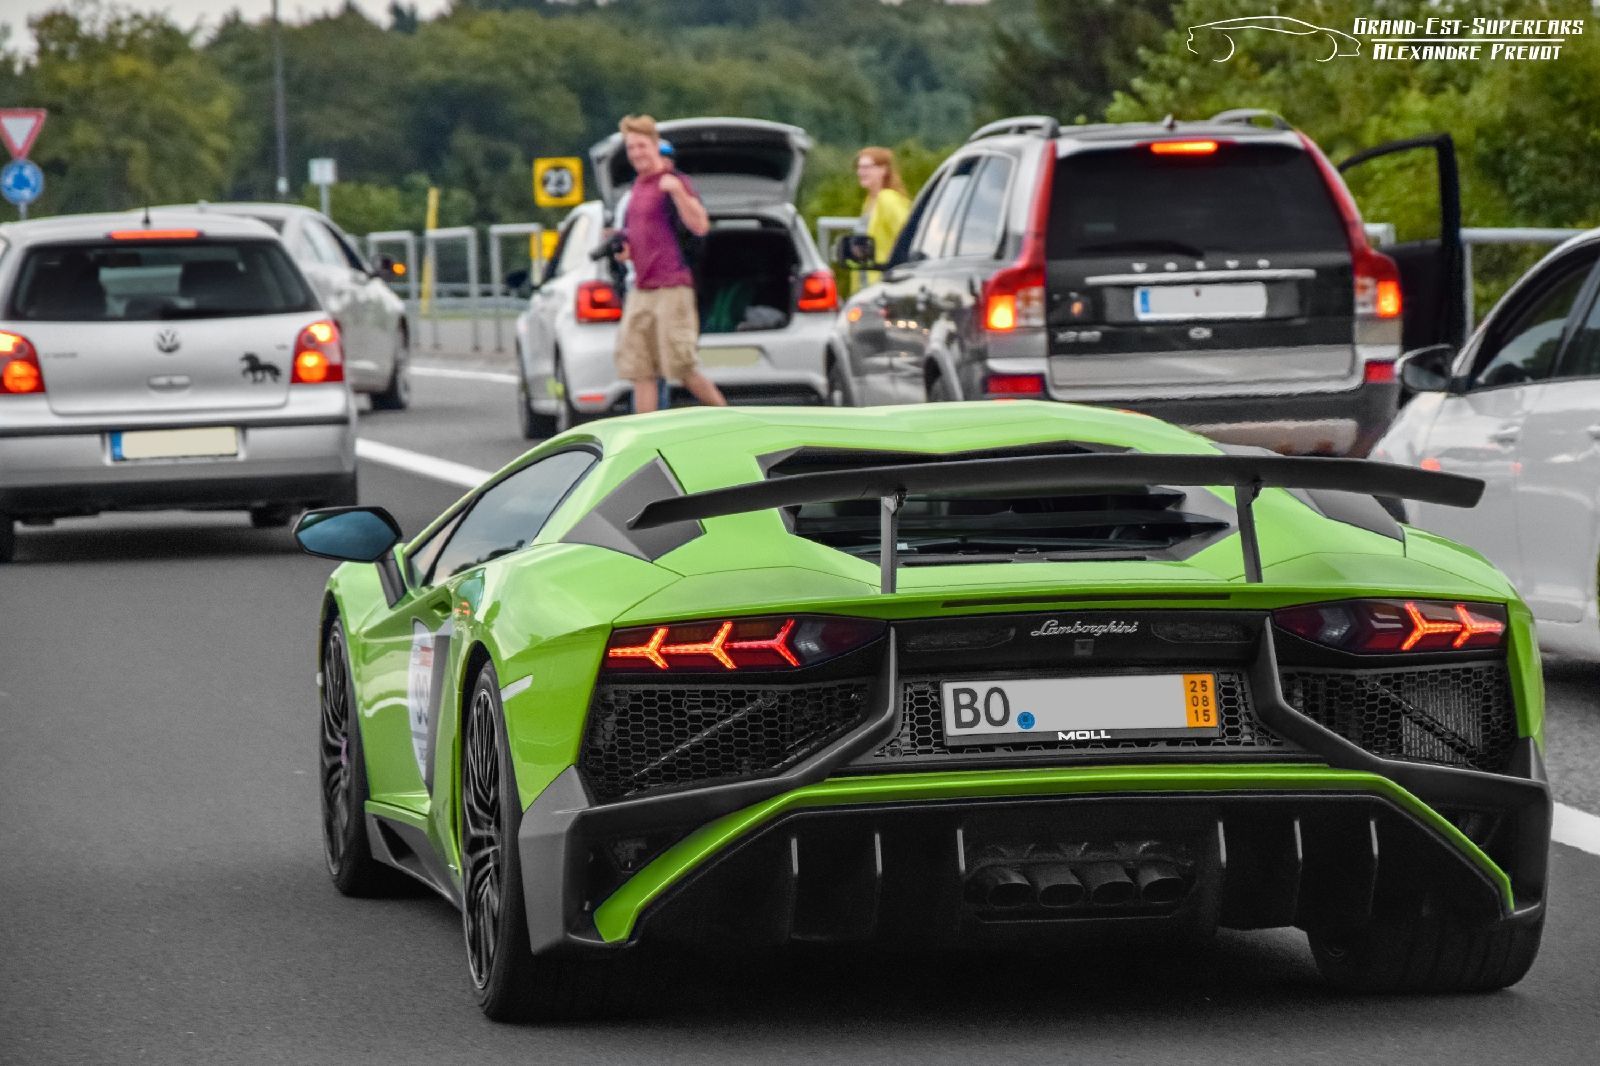 Lamborghini Superveloce 2015 The Sportiest Fastest And Most Emotional Lamborghini Bmw Series Bmw